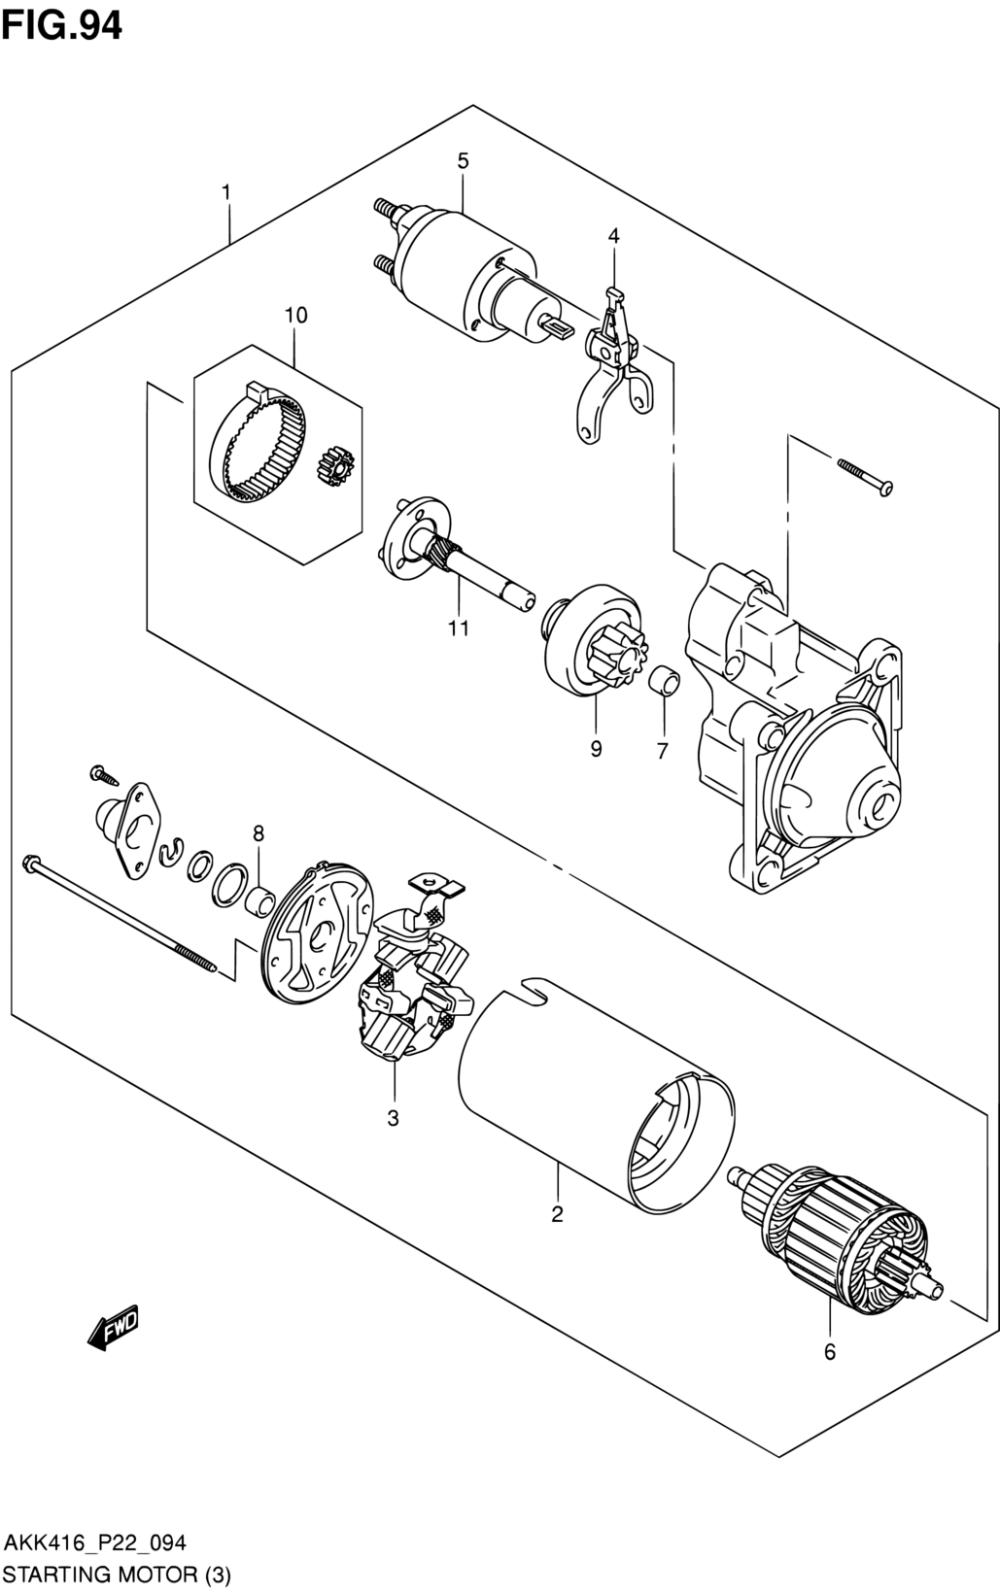 medium resolution of latin america sx4 akk416 p71 engine electrical 94 starting parts